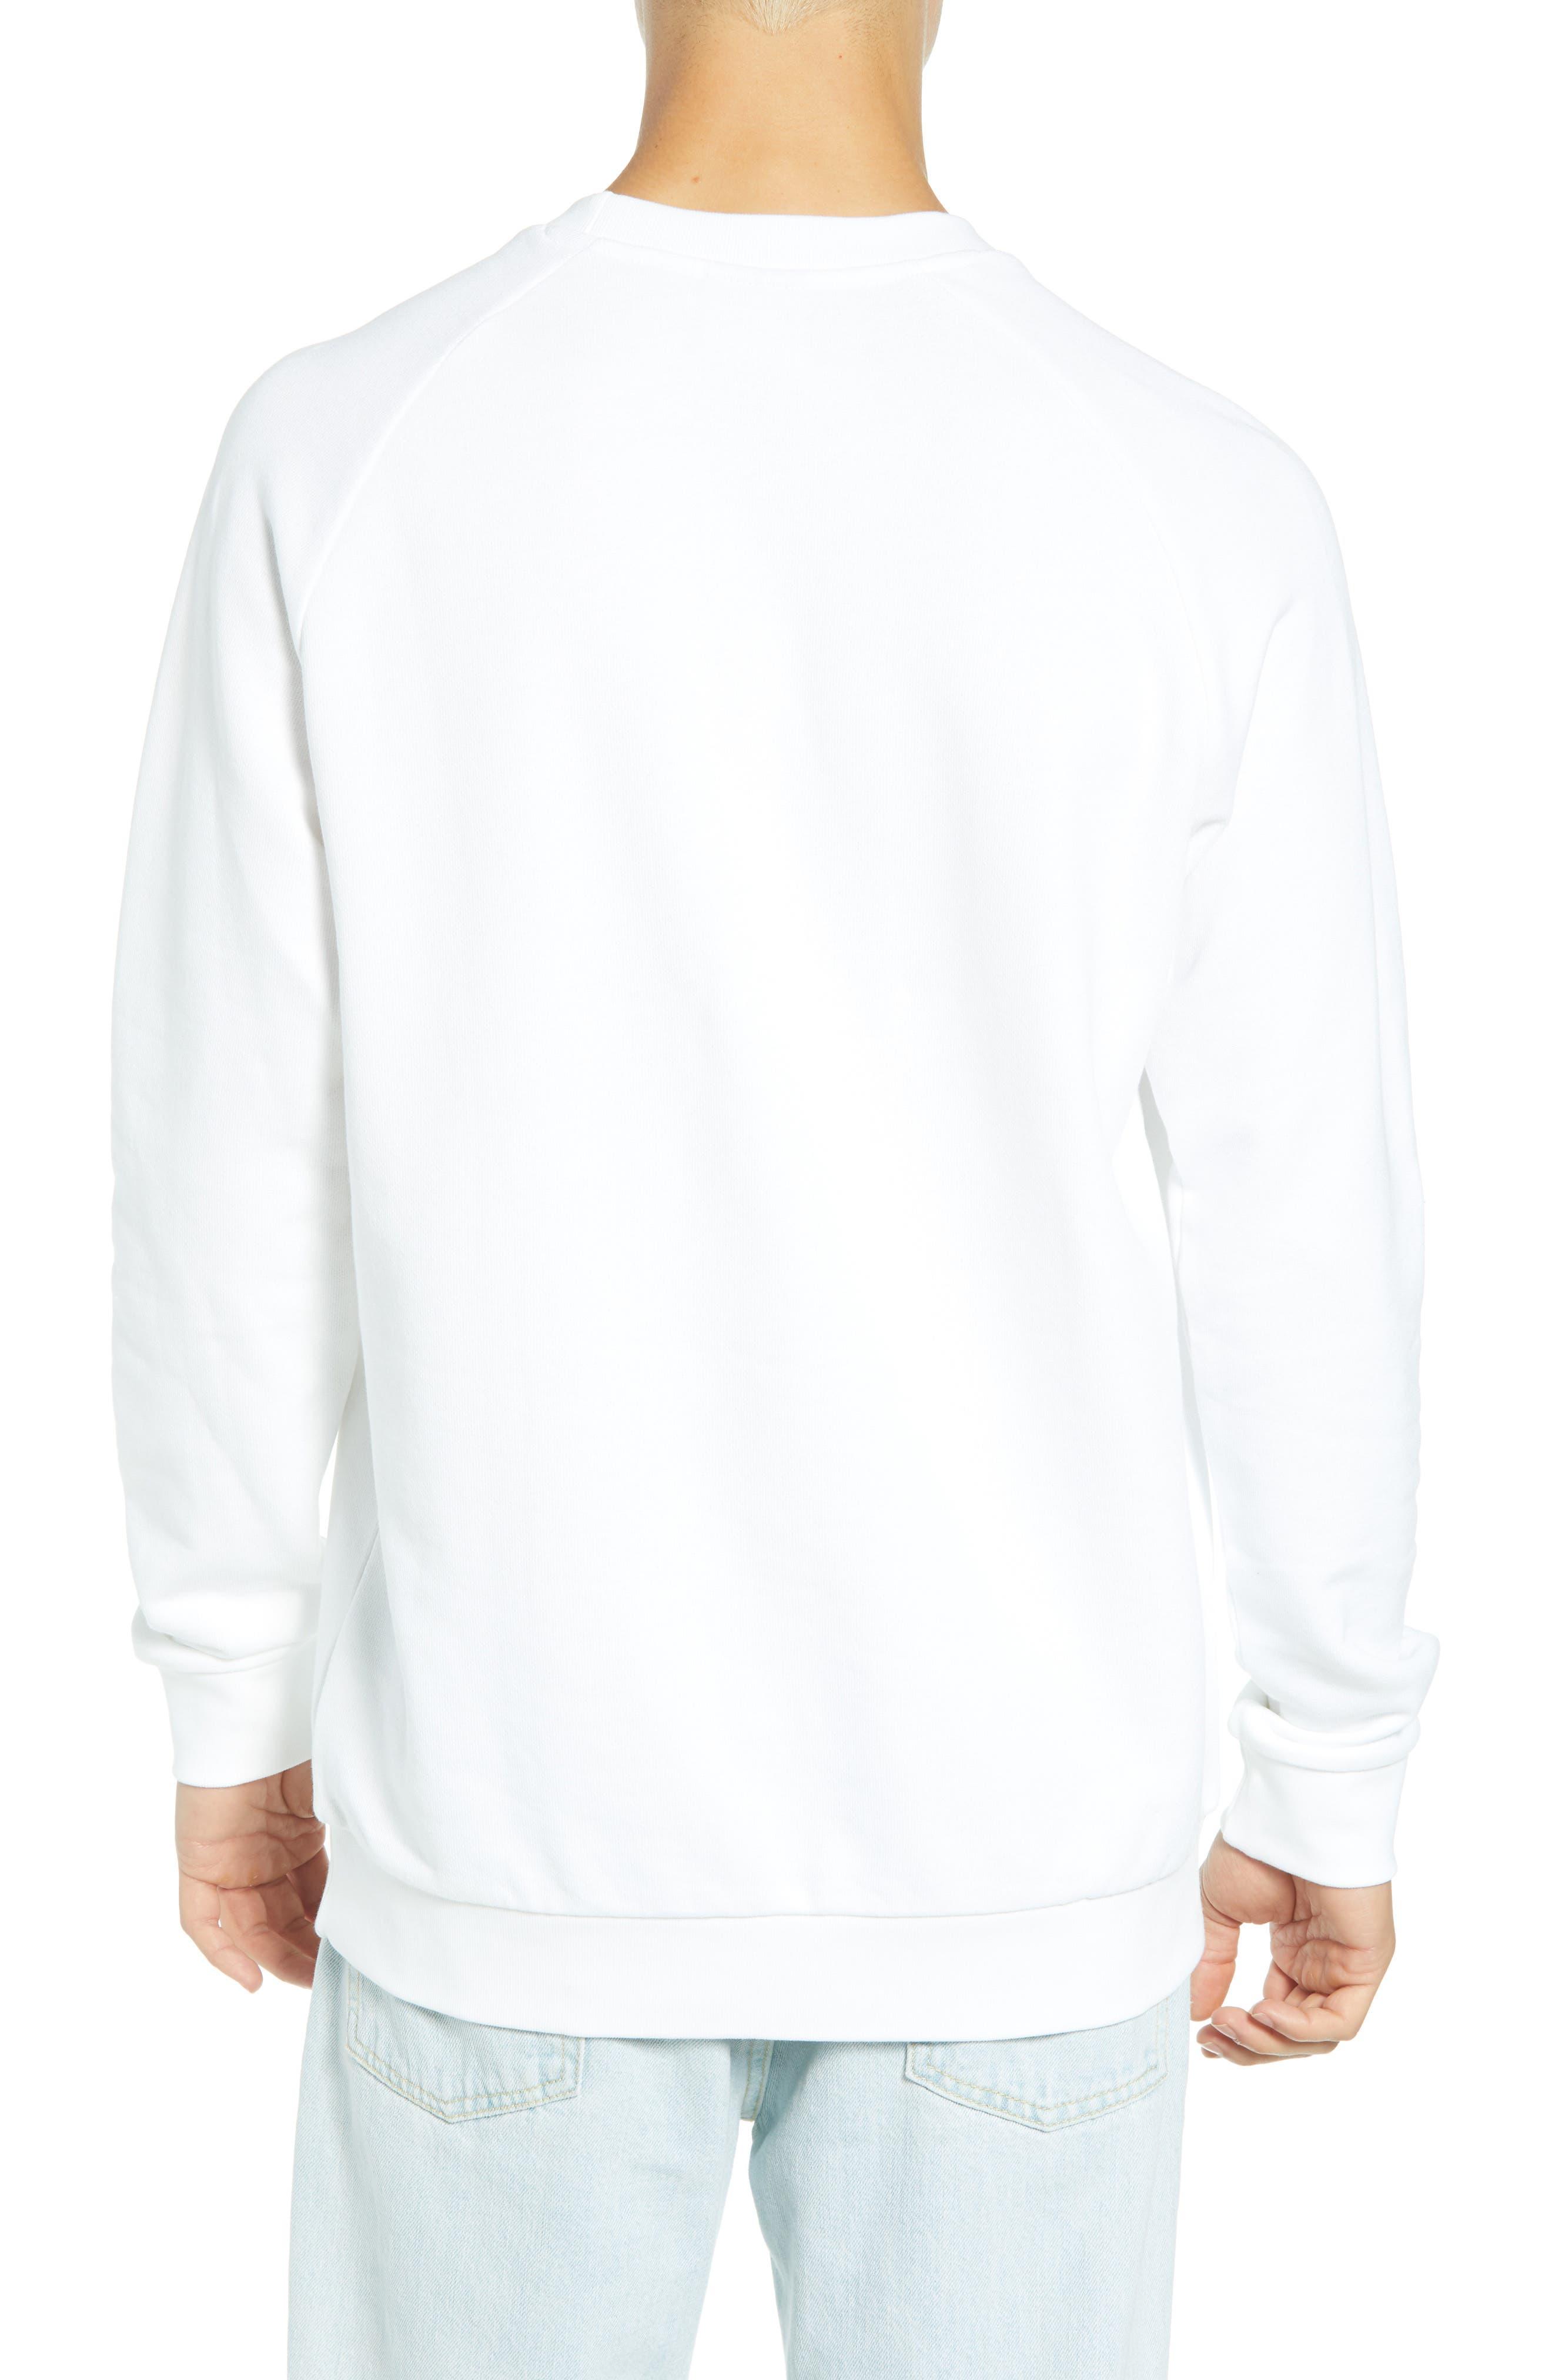 ADIDAS ORIGINALS, Trefoil Sweatshirt, Alternate thumbnail 2, color, WHITE